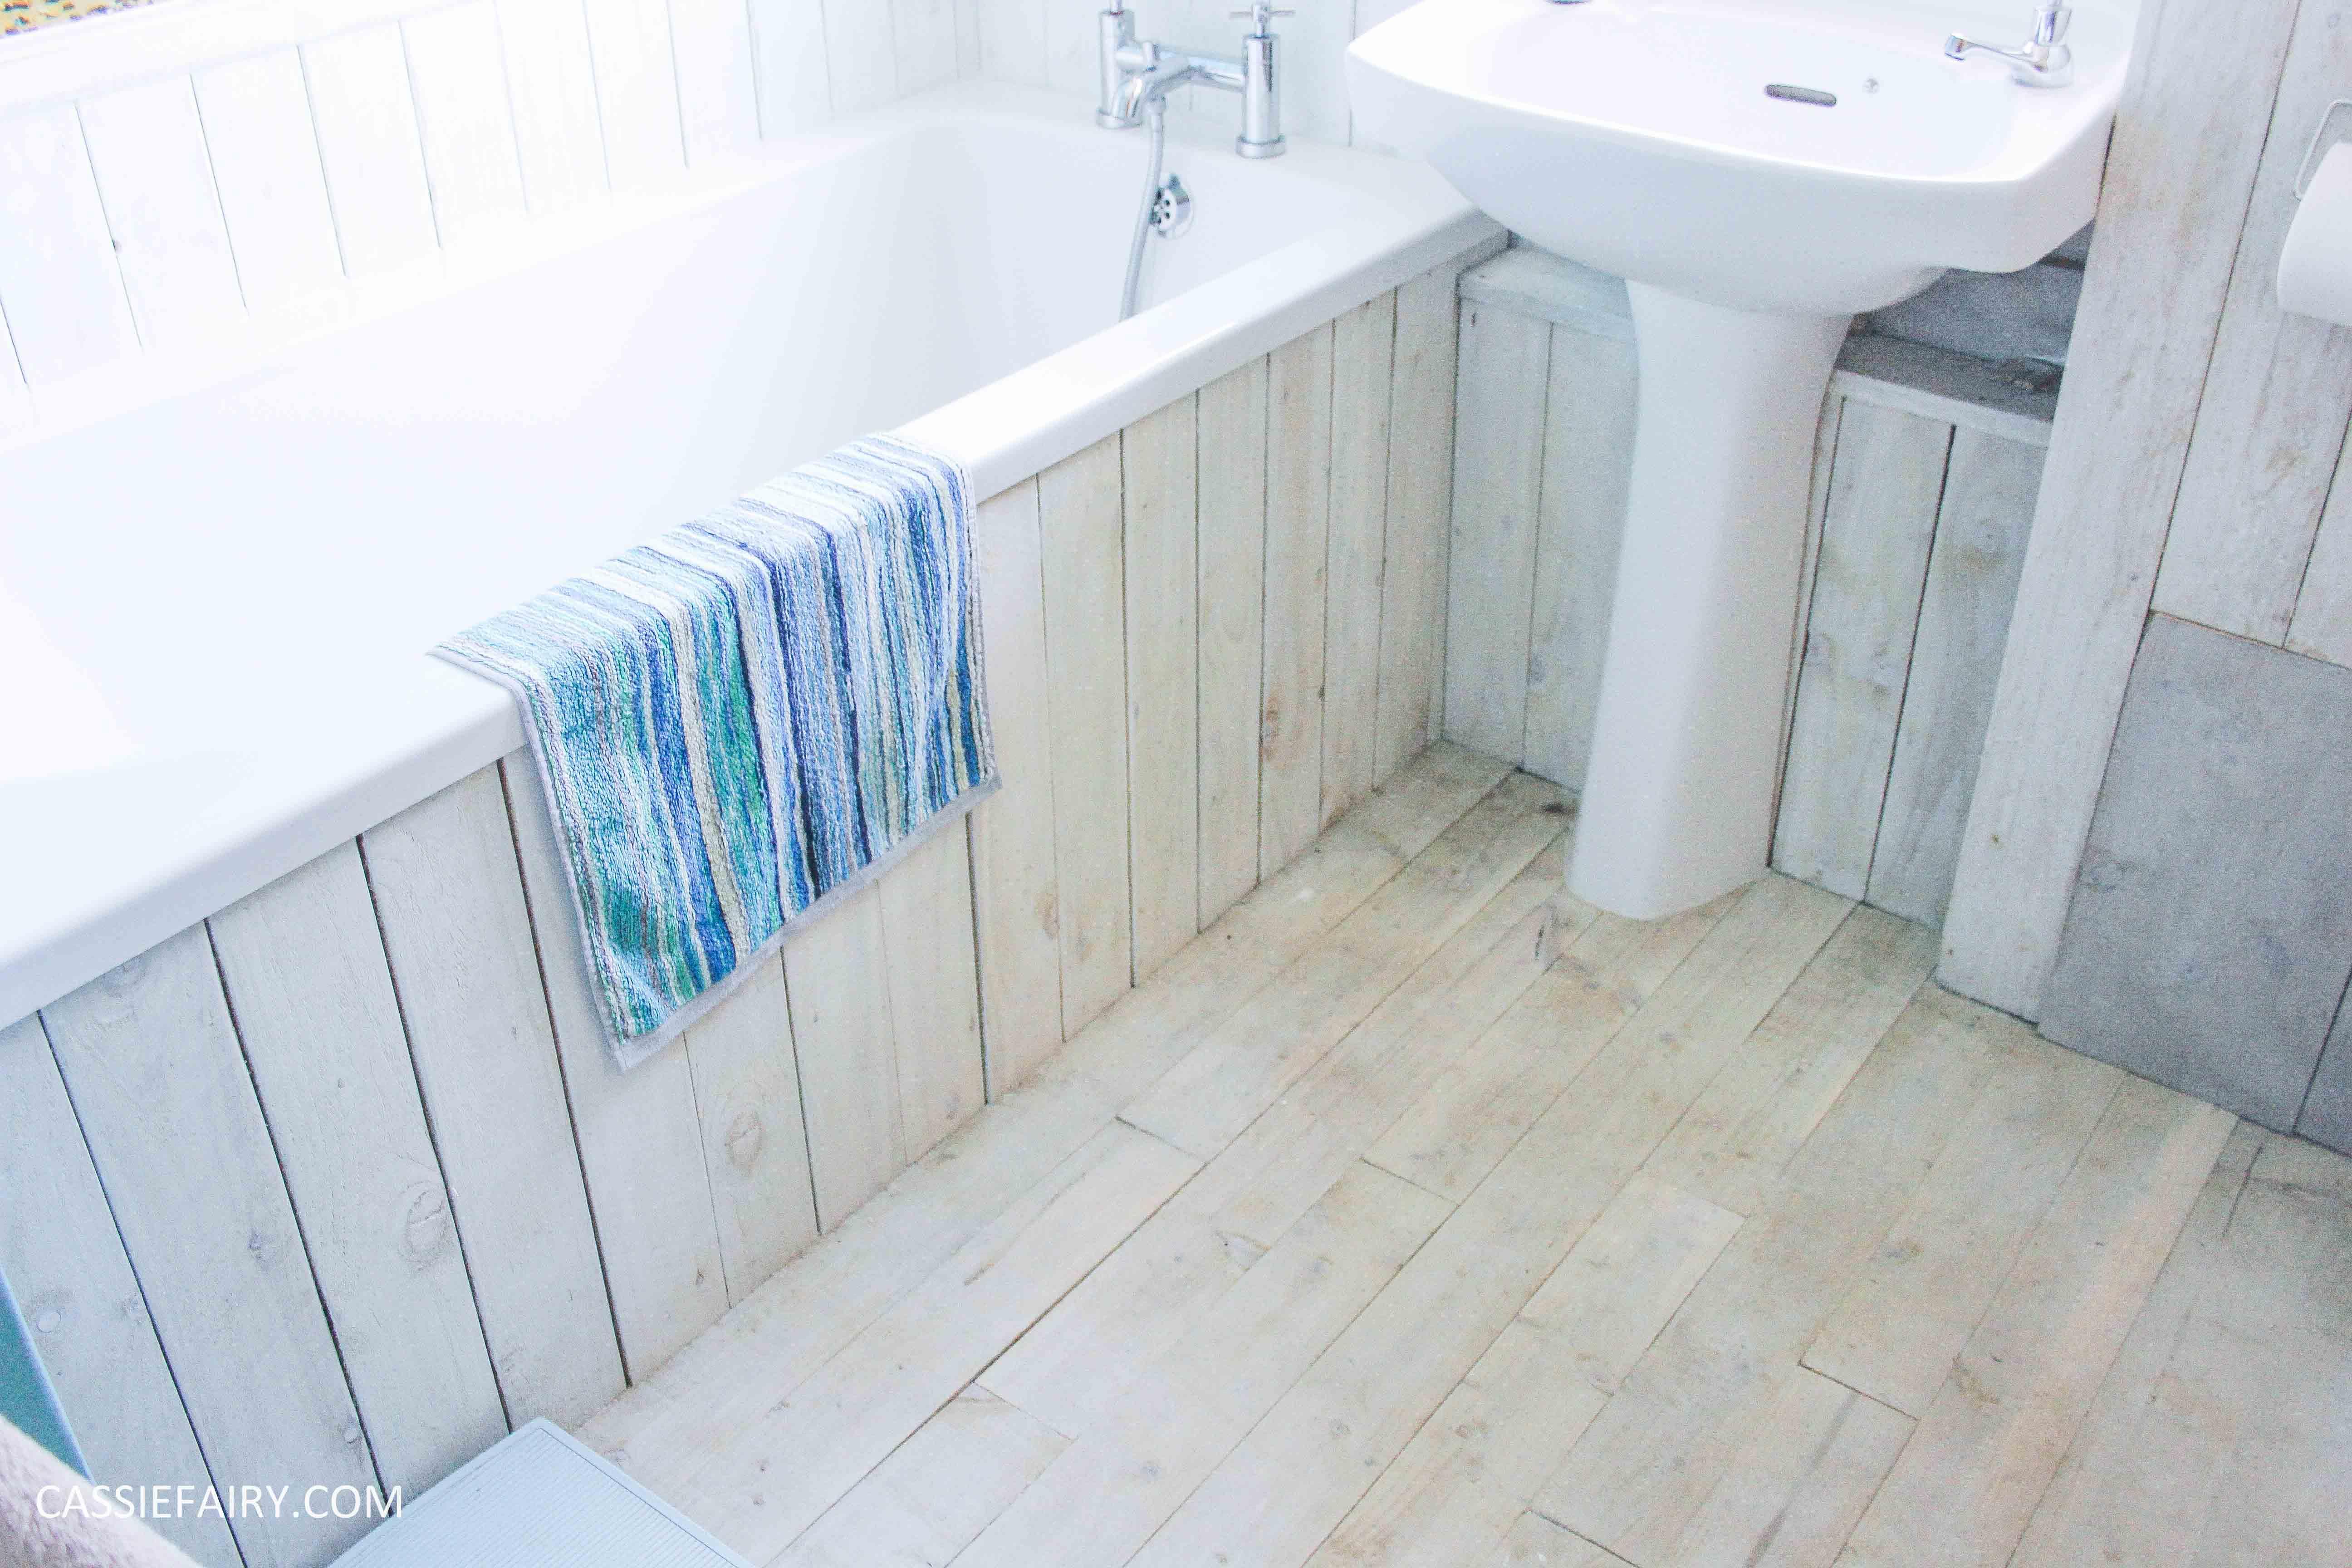 ... Diy Beach Hut Bathroom Makeover Project   Low Budget Renovation 16